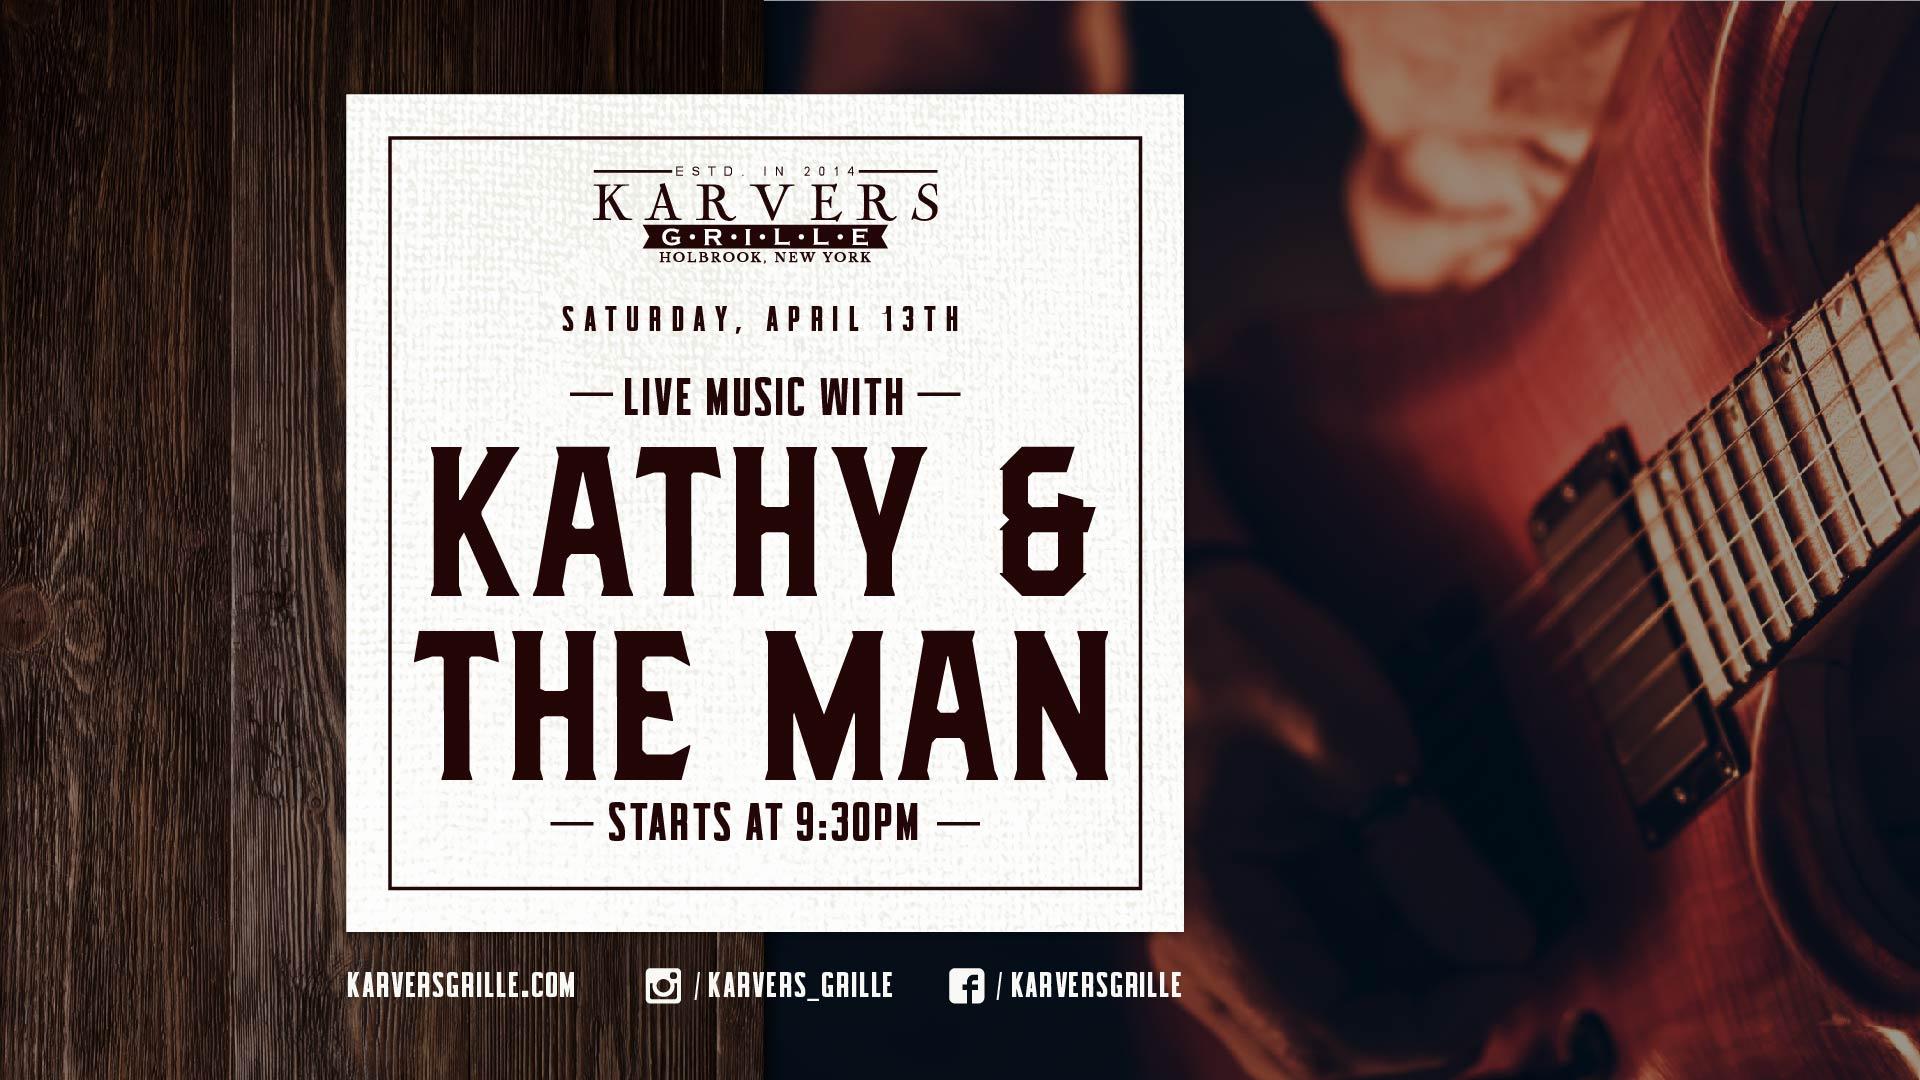 Kathy & The Man